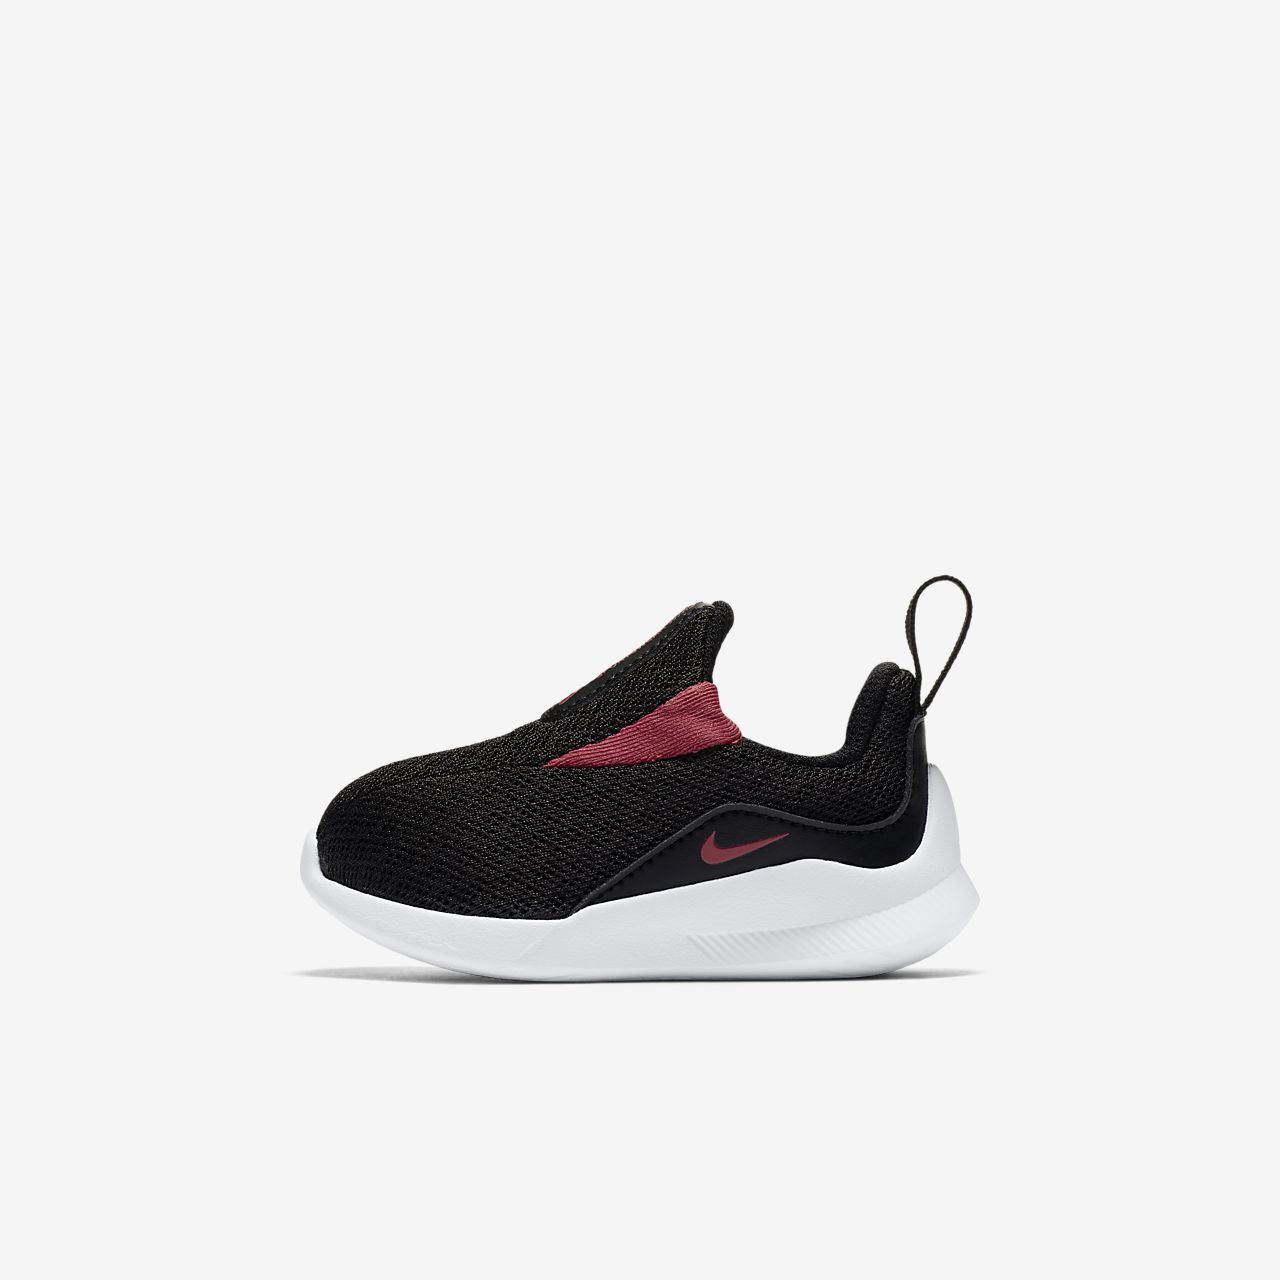 0ae7dee0fa76 Nike Viale Toddler Shoe. Nike.com GB